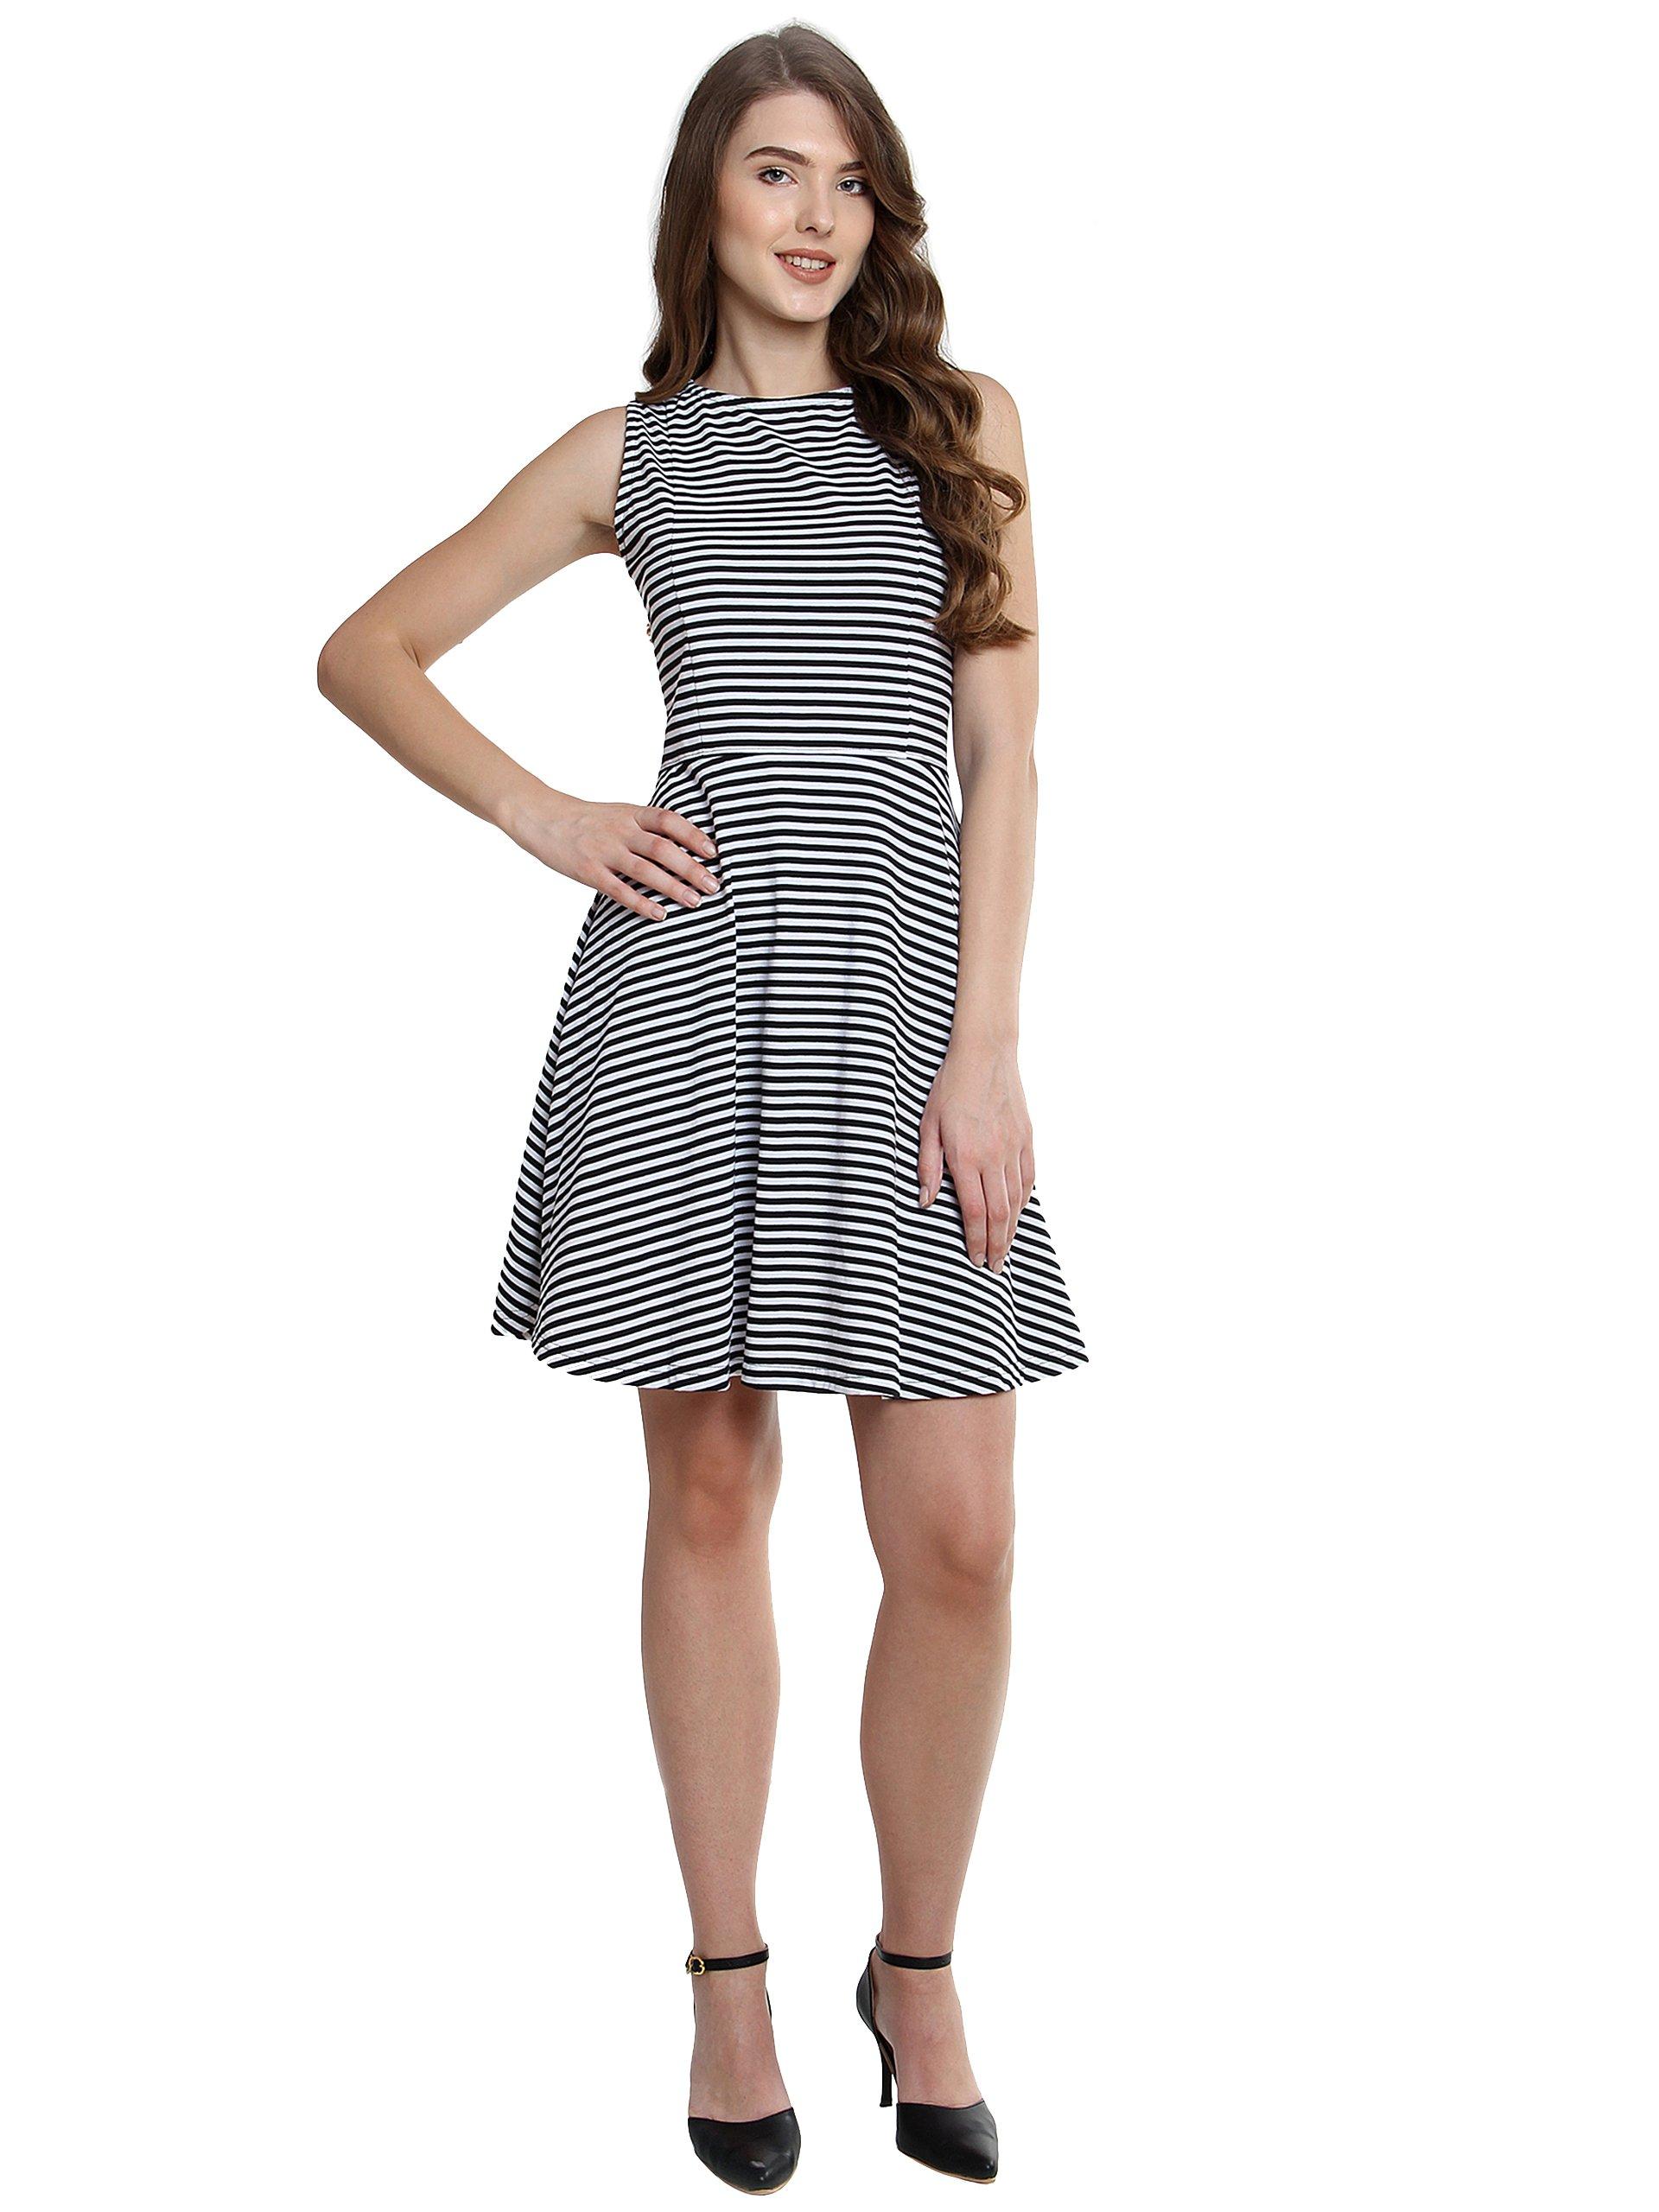 b59a0e07308a Miss Chase Women s Black and White Striped Skater Dress - Gia Designer